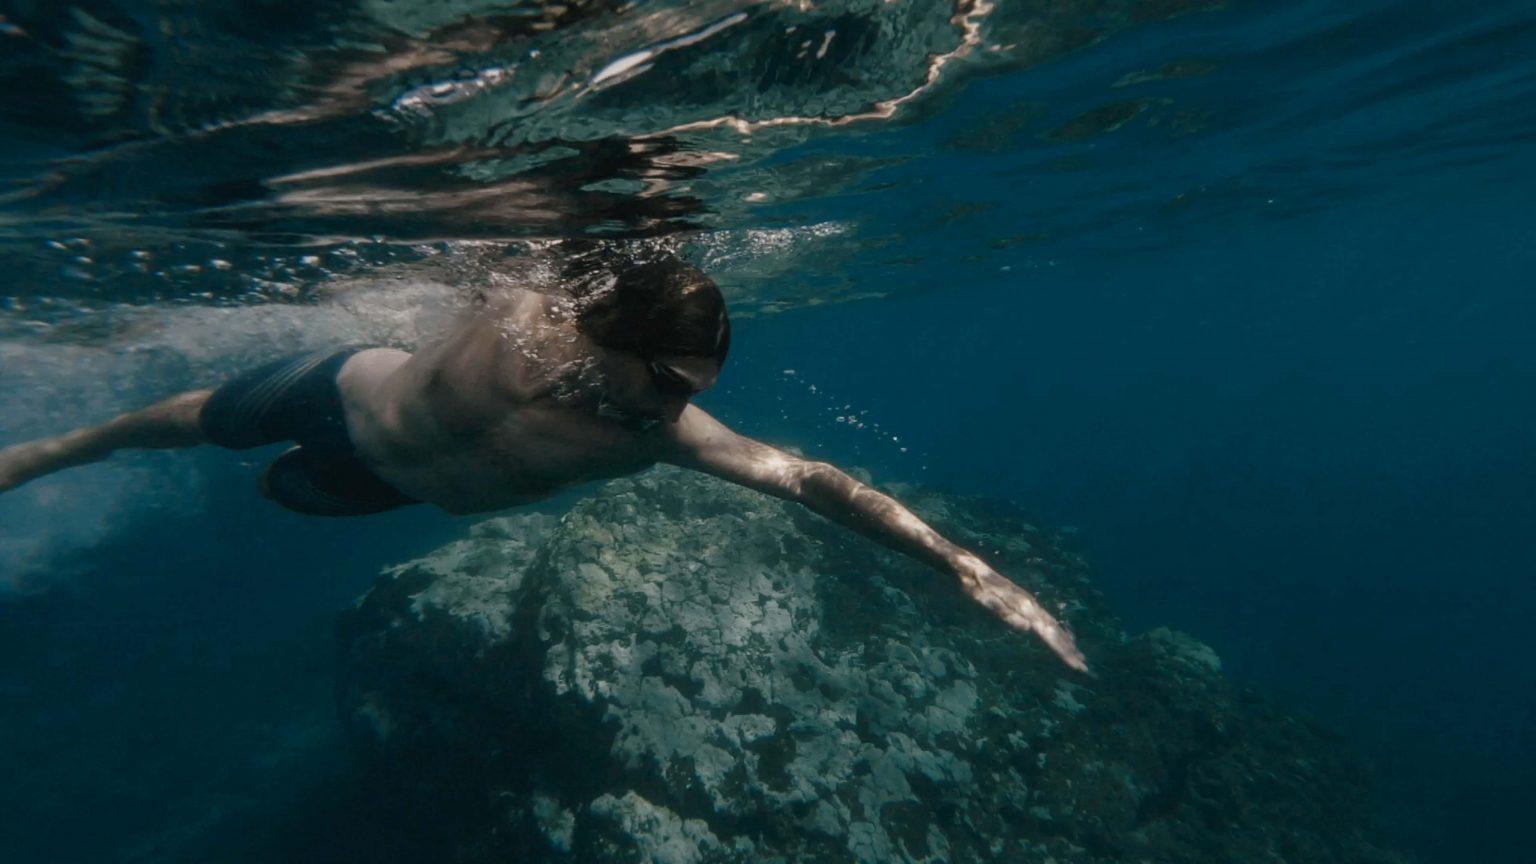 oxbow-tournage-aquatique-mringalss-films-pays-basque-anglet-bayonne-biarritz-pierre-frechou